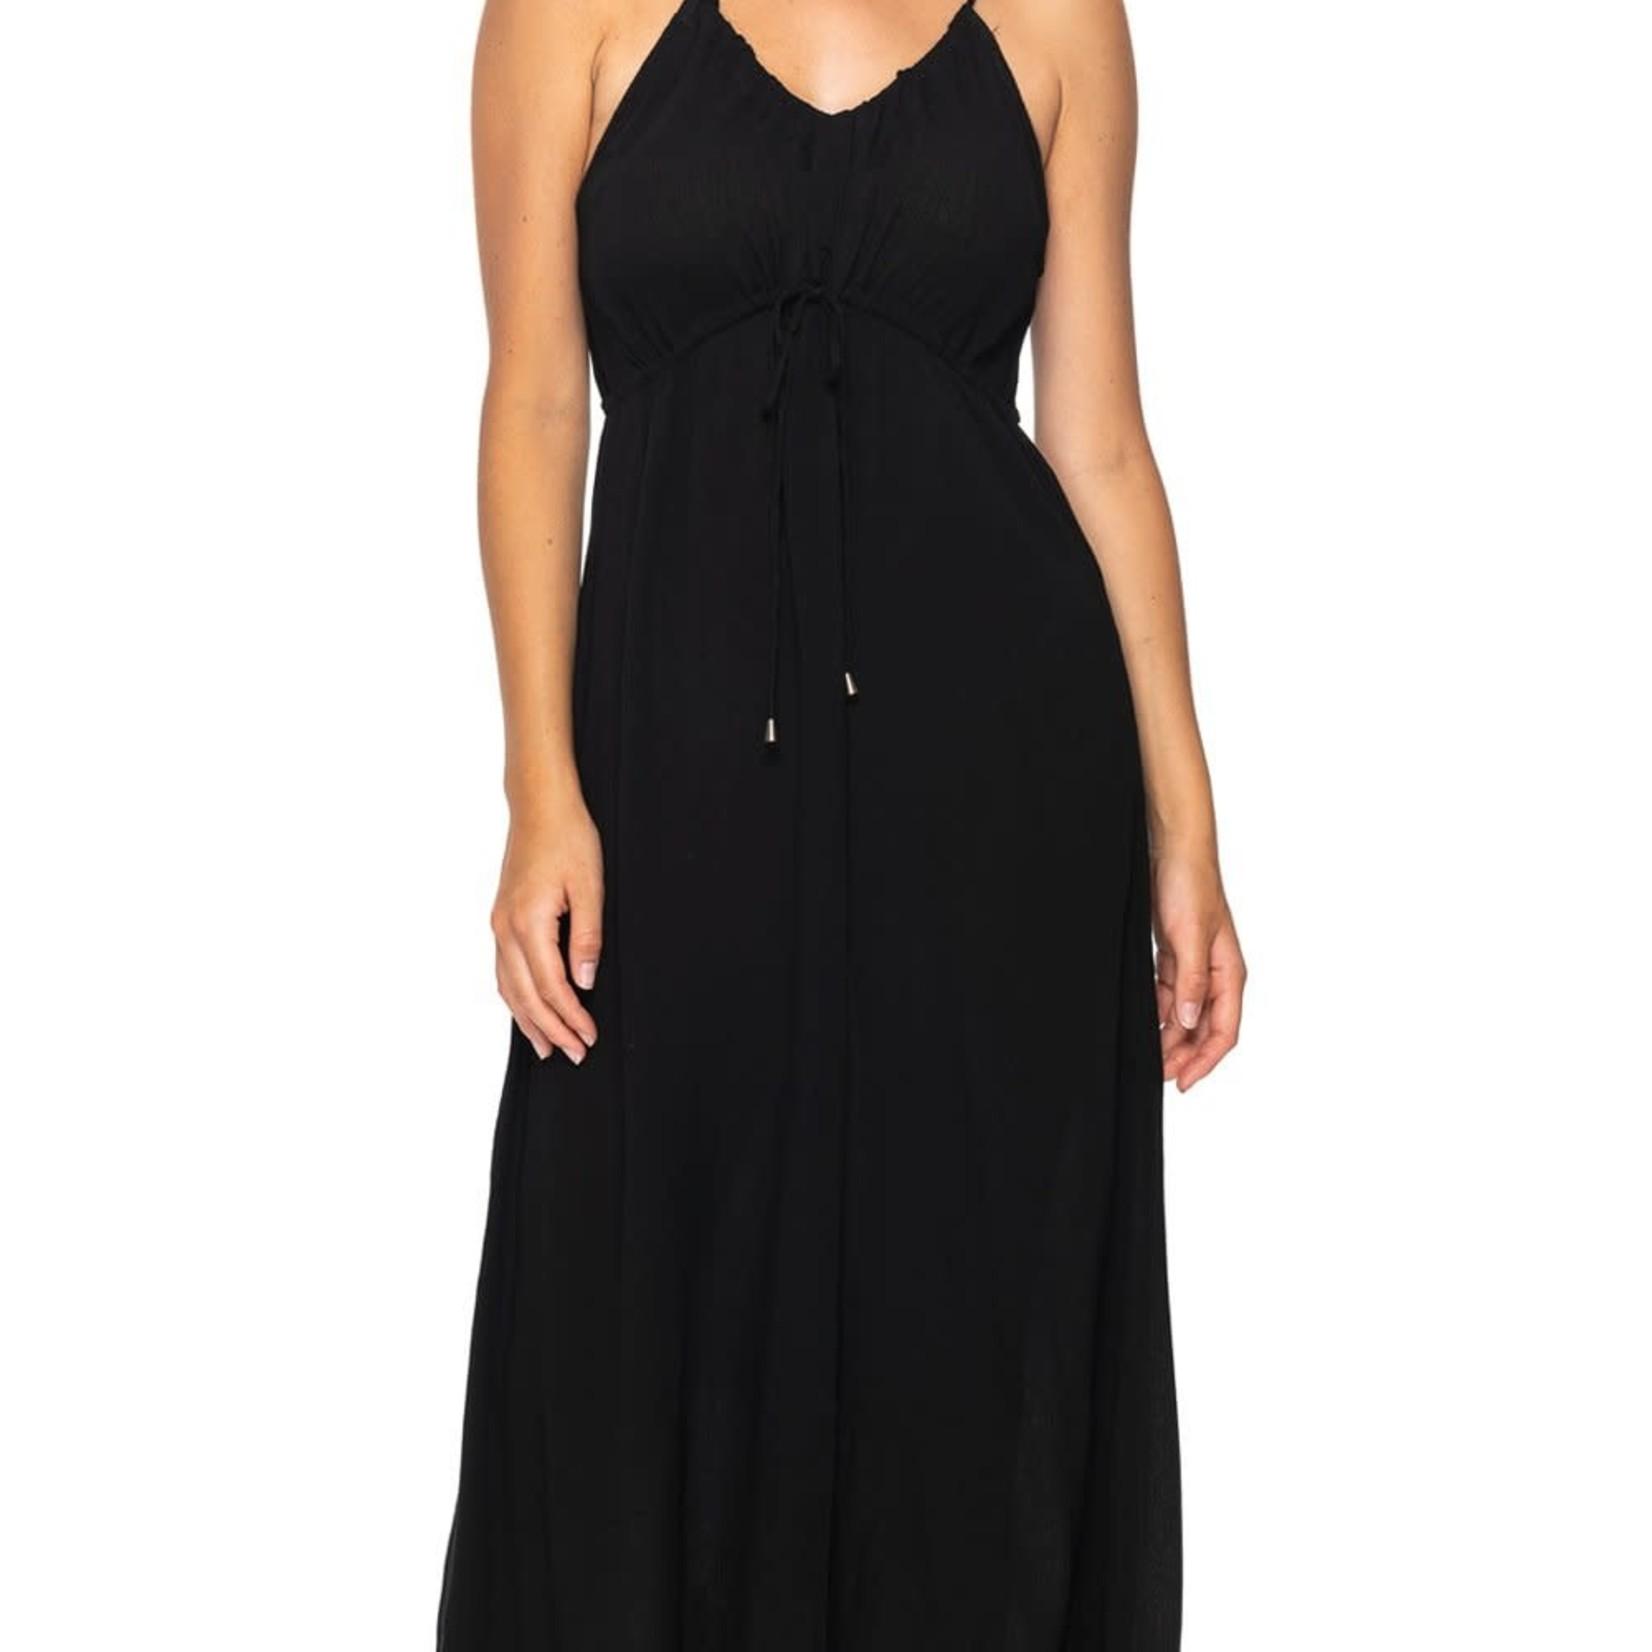 Alchemy Fashions Crepe Dress